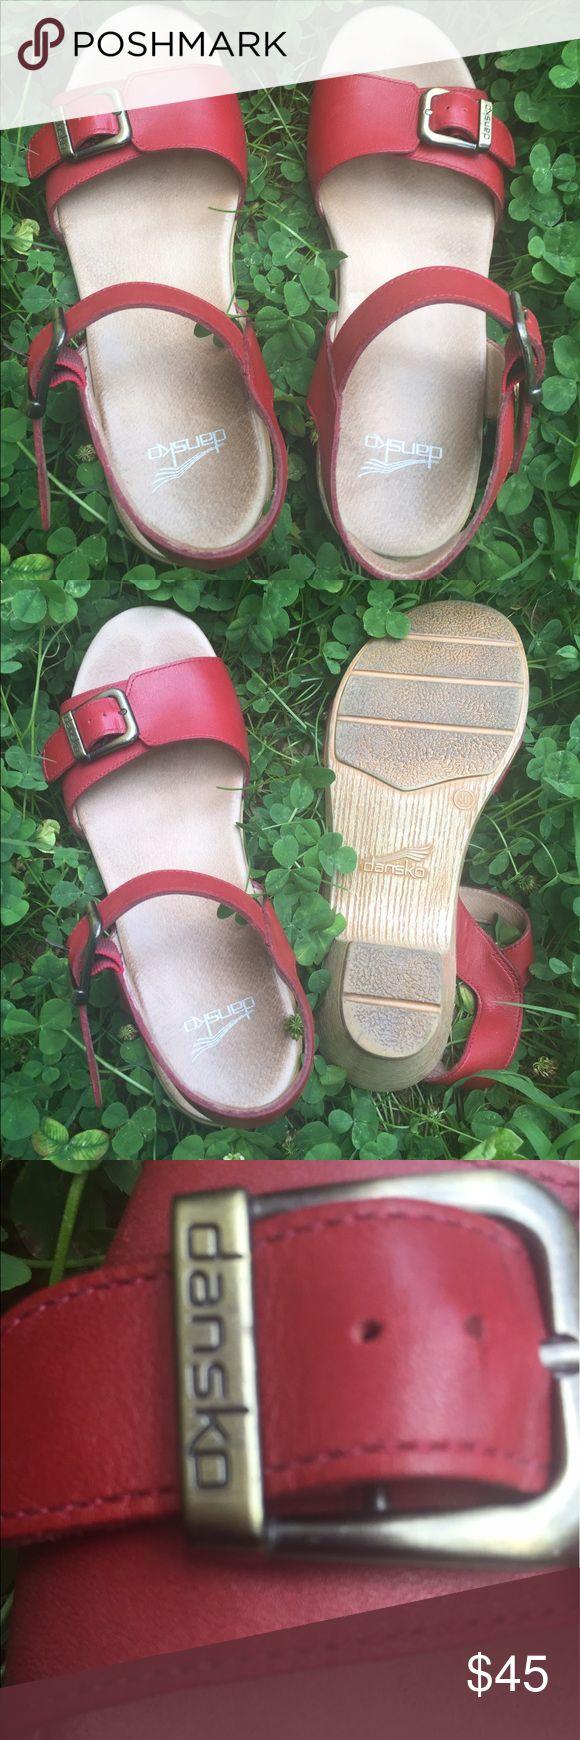 Dansko Red sandal Great RED engine sandal...... comfortable brand and in wonderful condition! Dansko Shoes Sandals